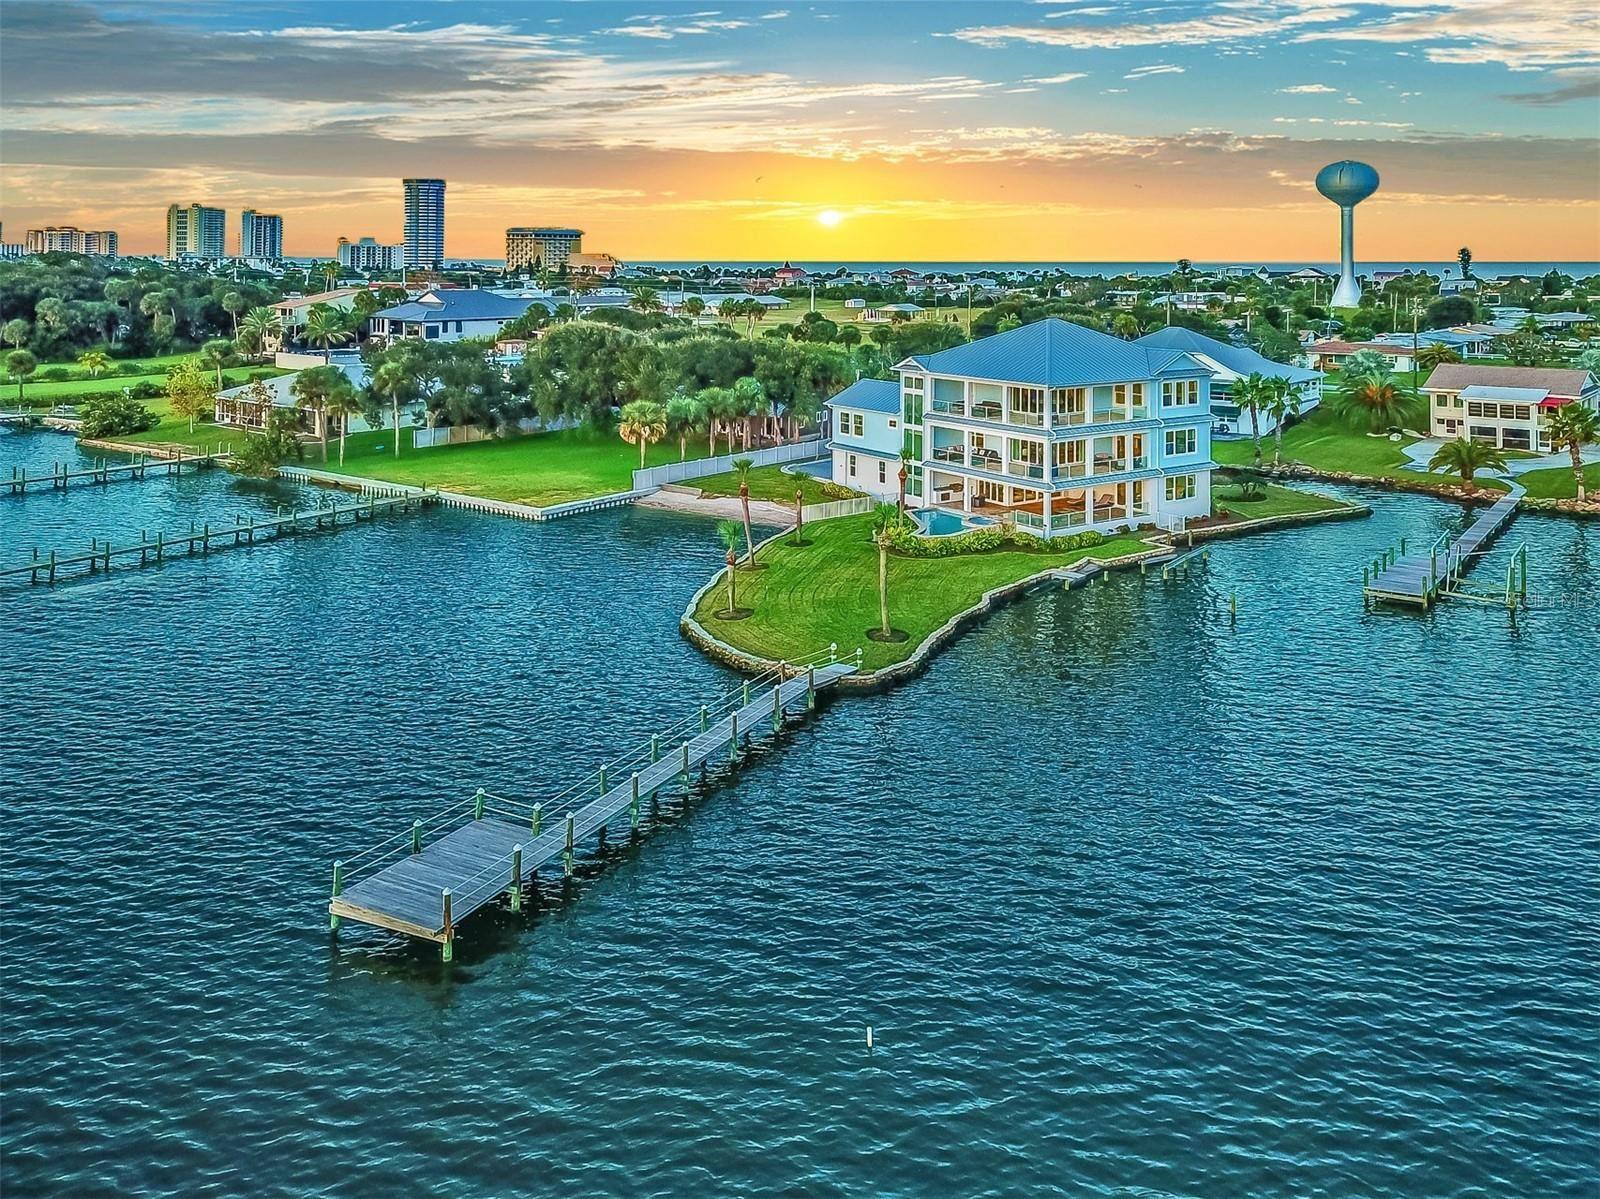 Property Image Of 2810 S Peninsula Drive In Daytona Beach, Fl